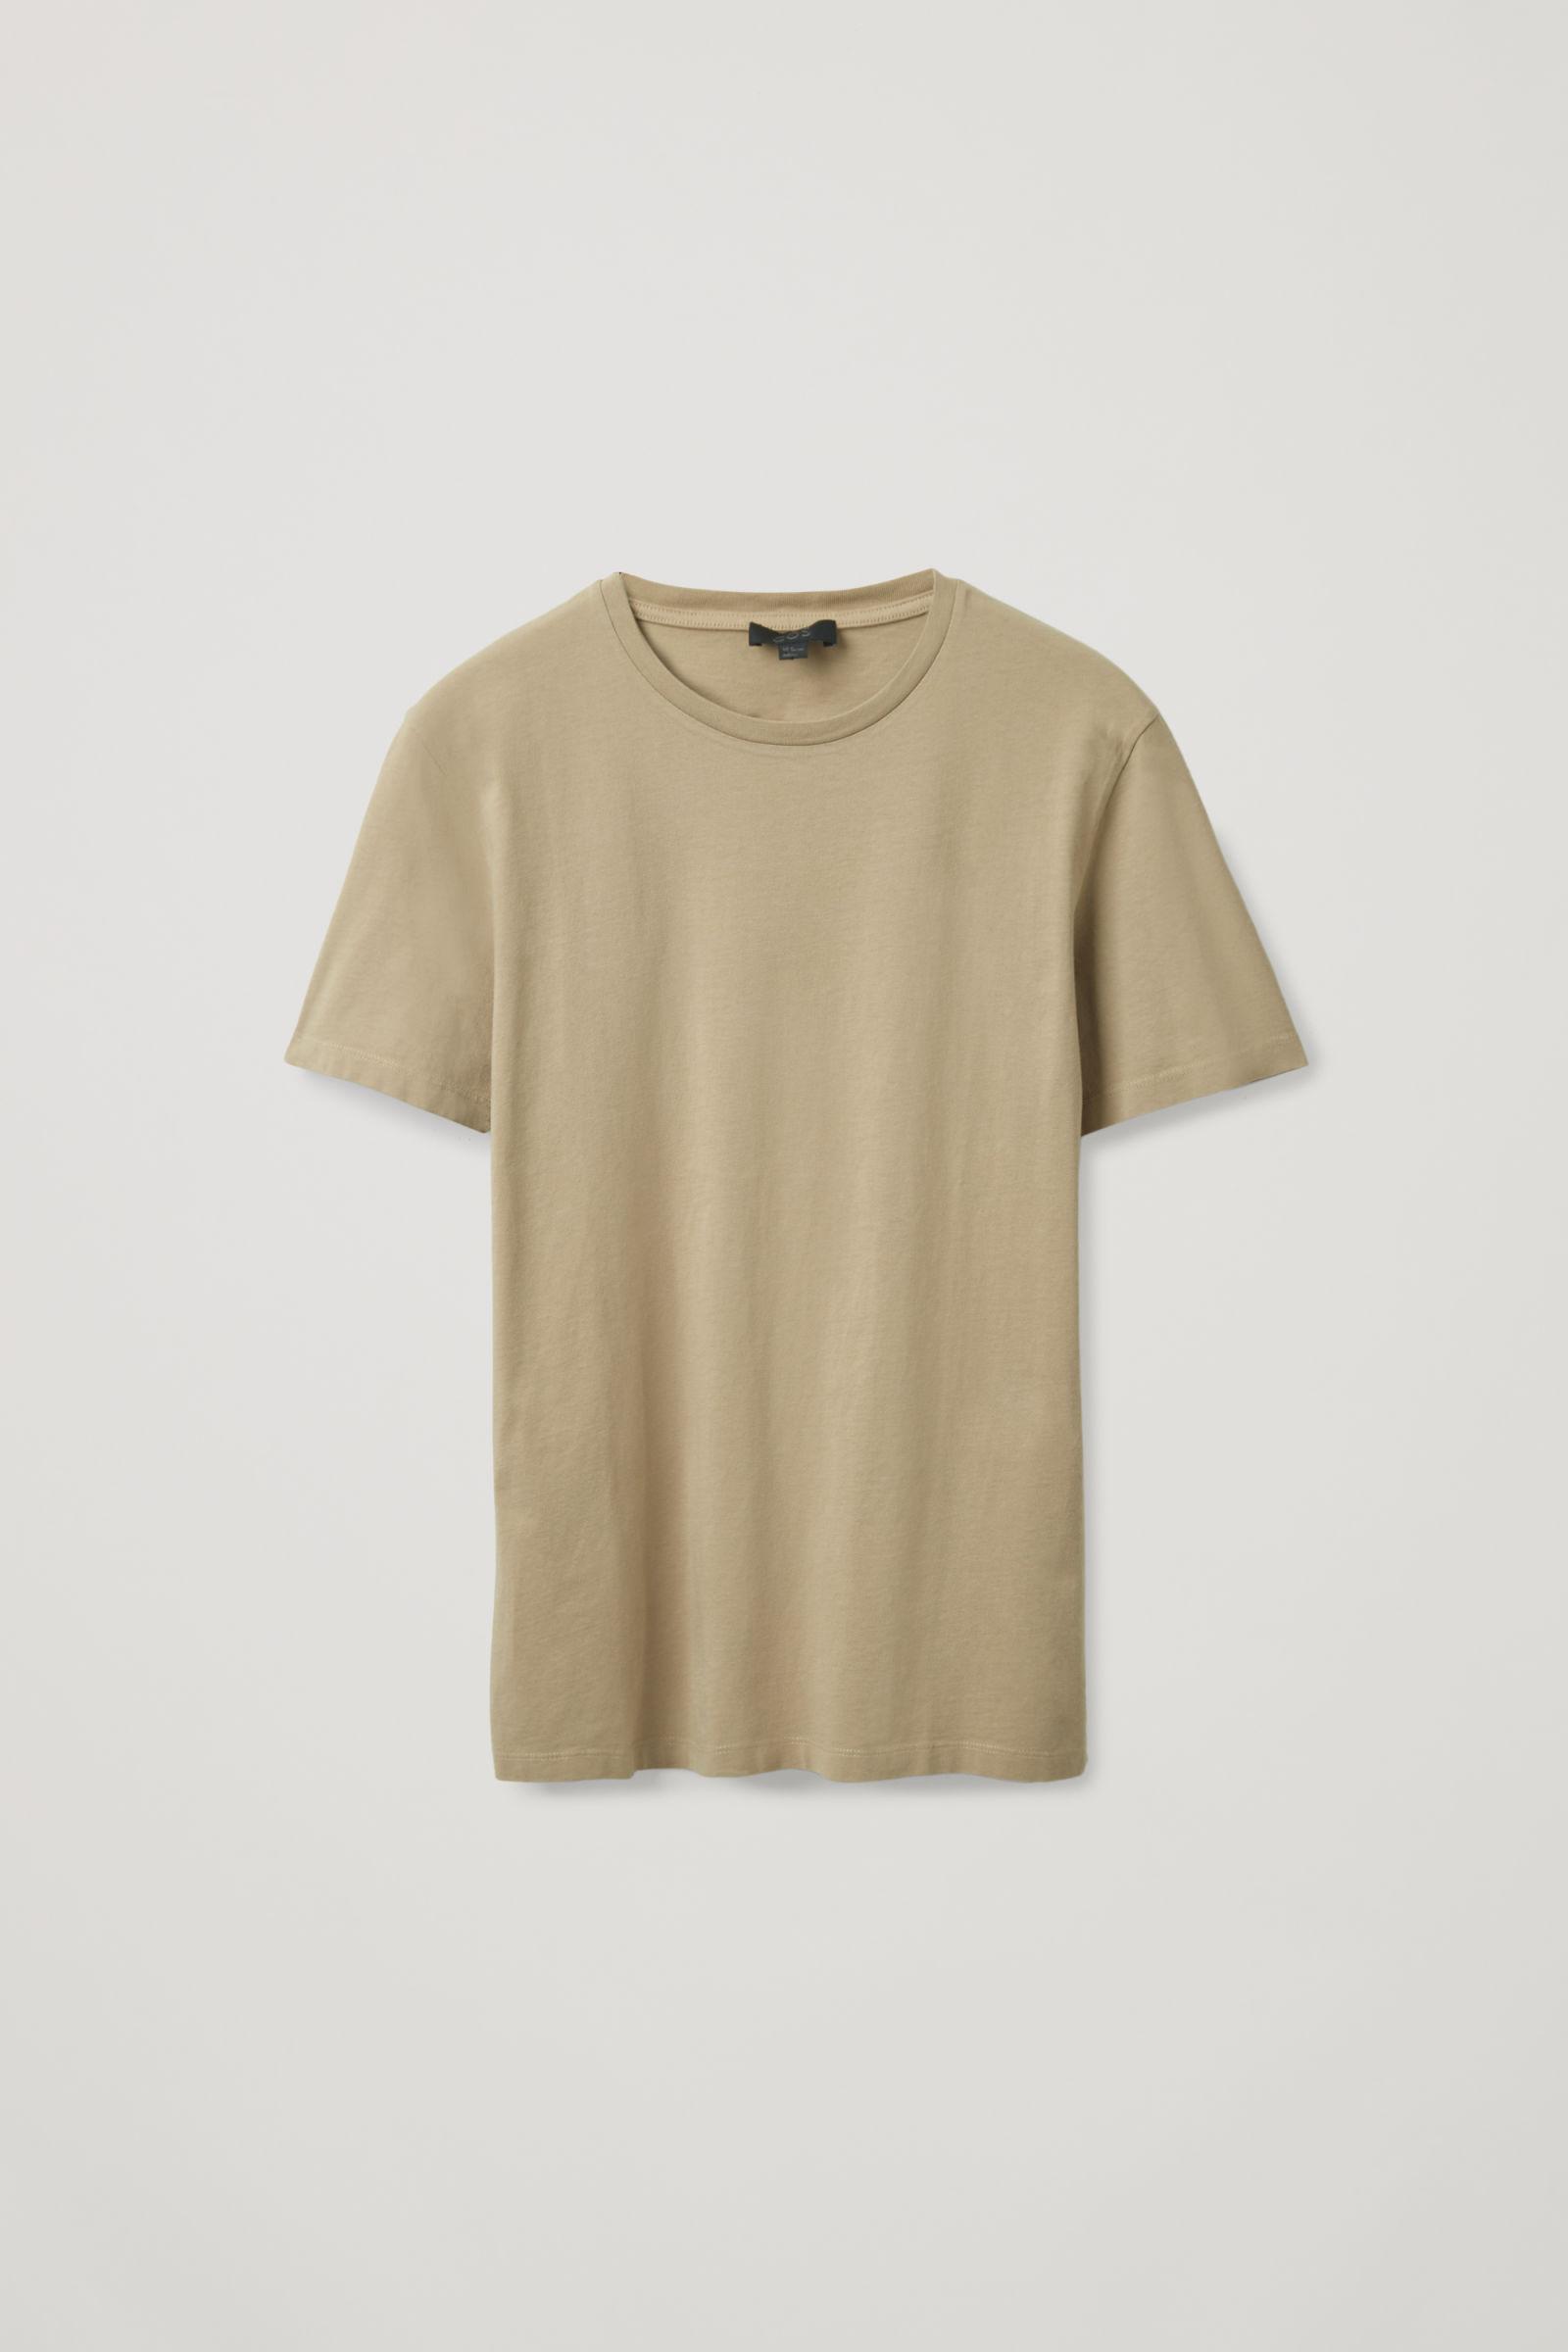 COS REGULAR-FIT T-SHIRT,beige